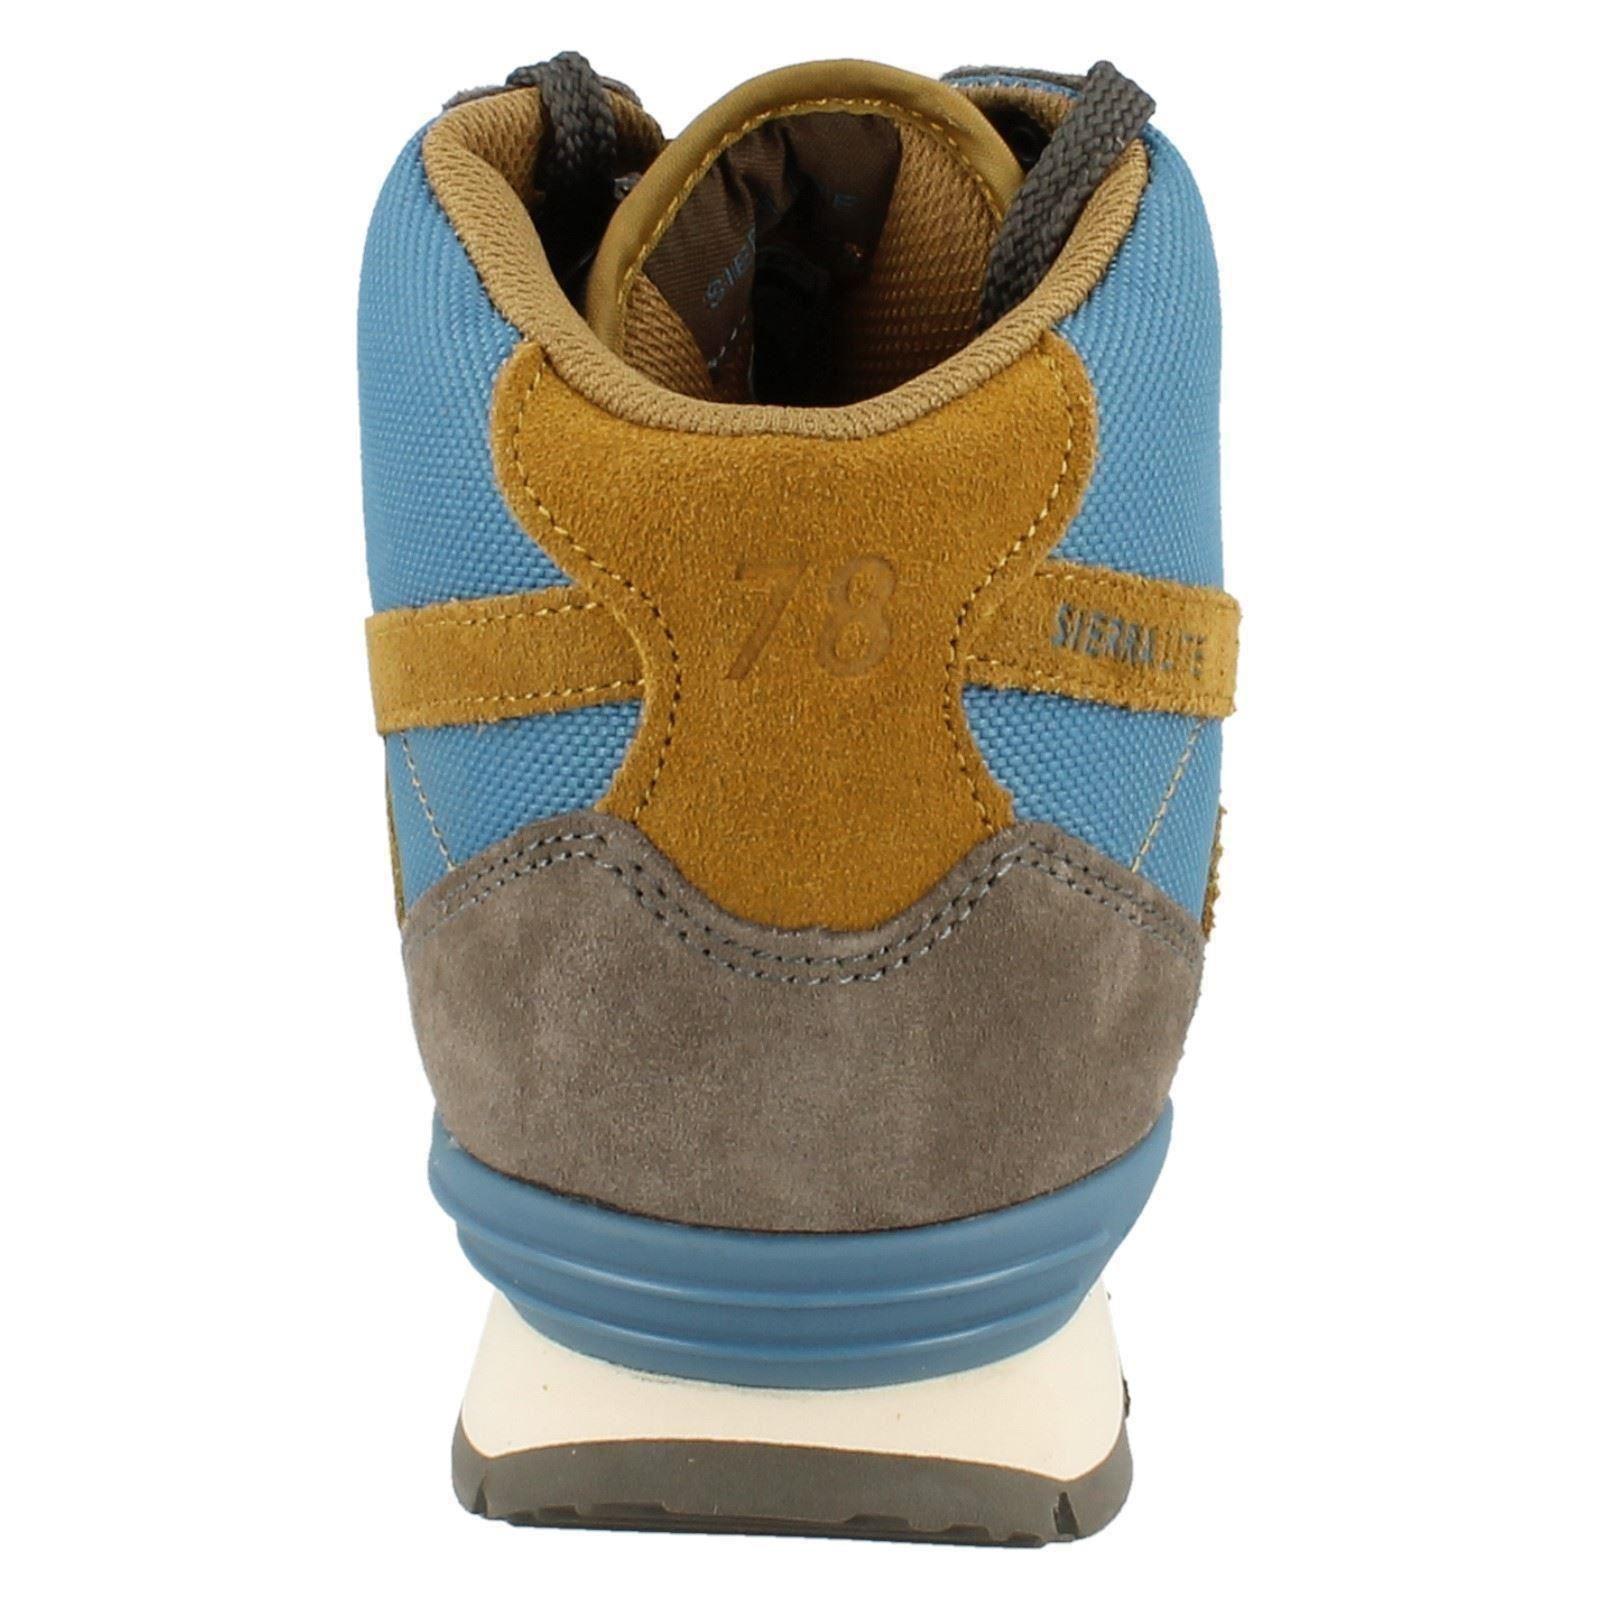 Mens Hi-Tec Manmade Boots *Sierra Lite Original WP*